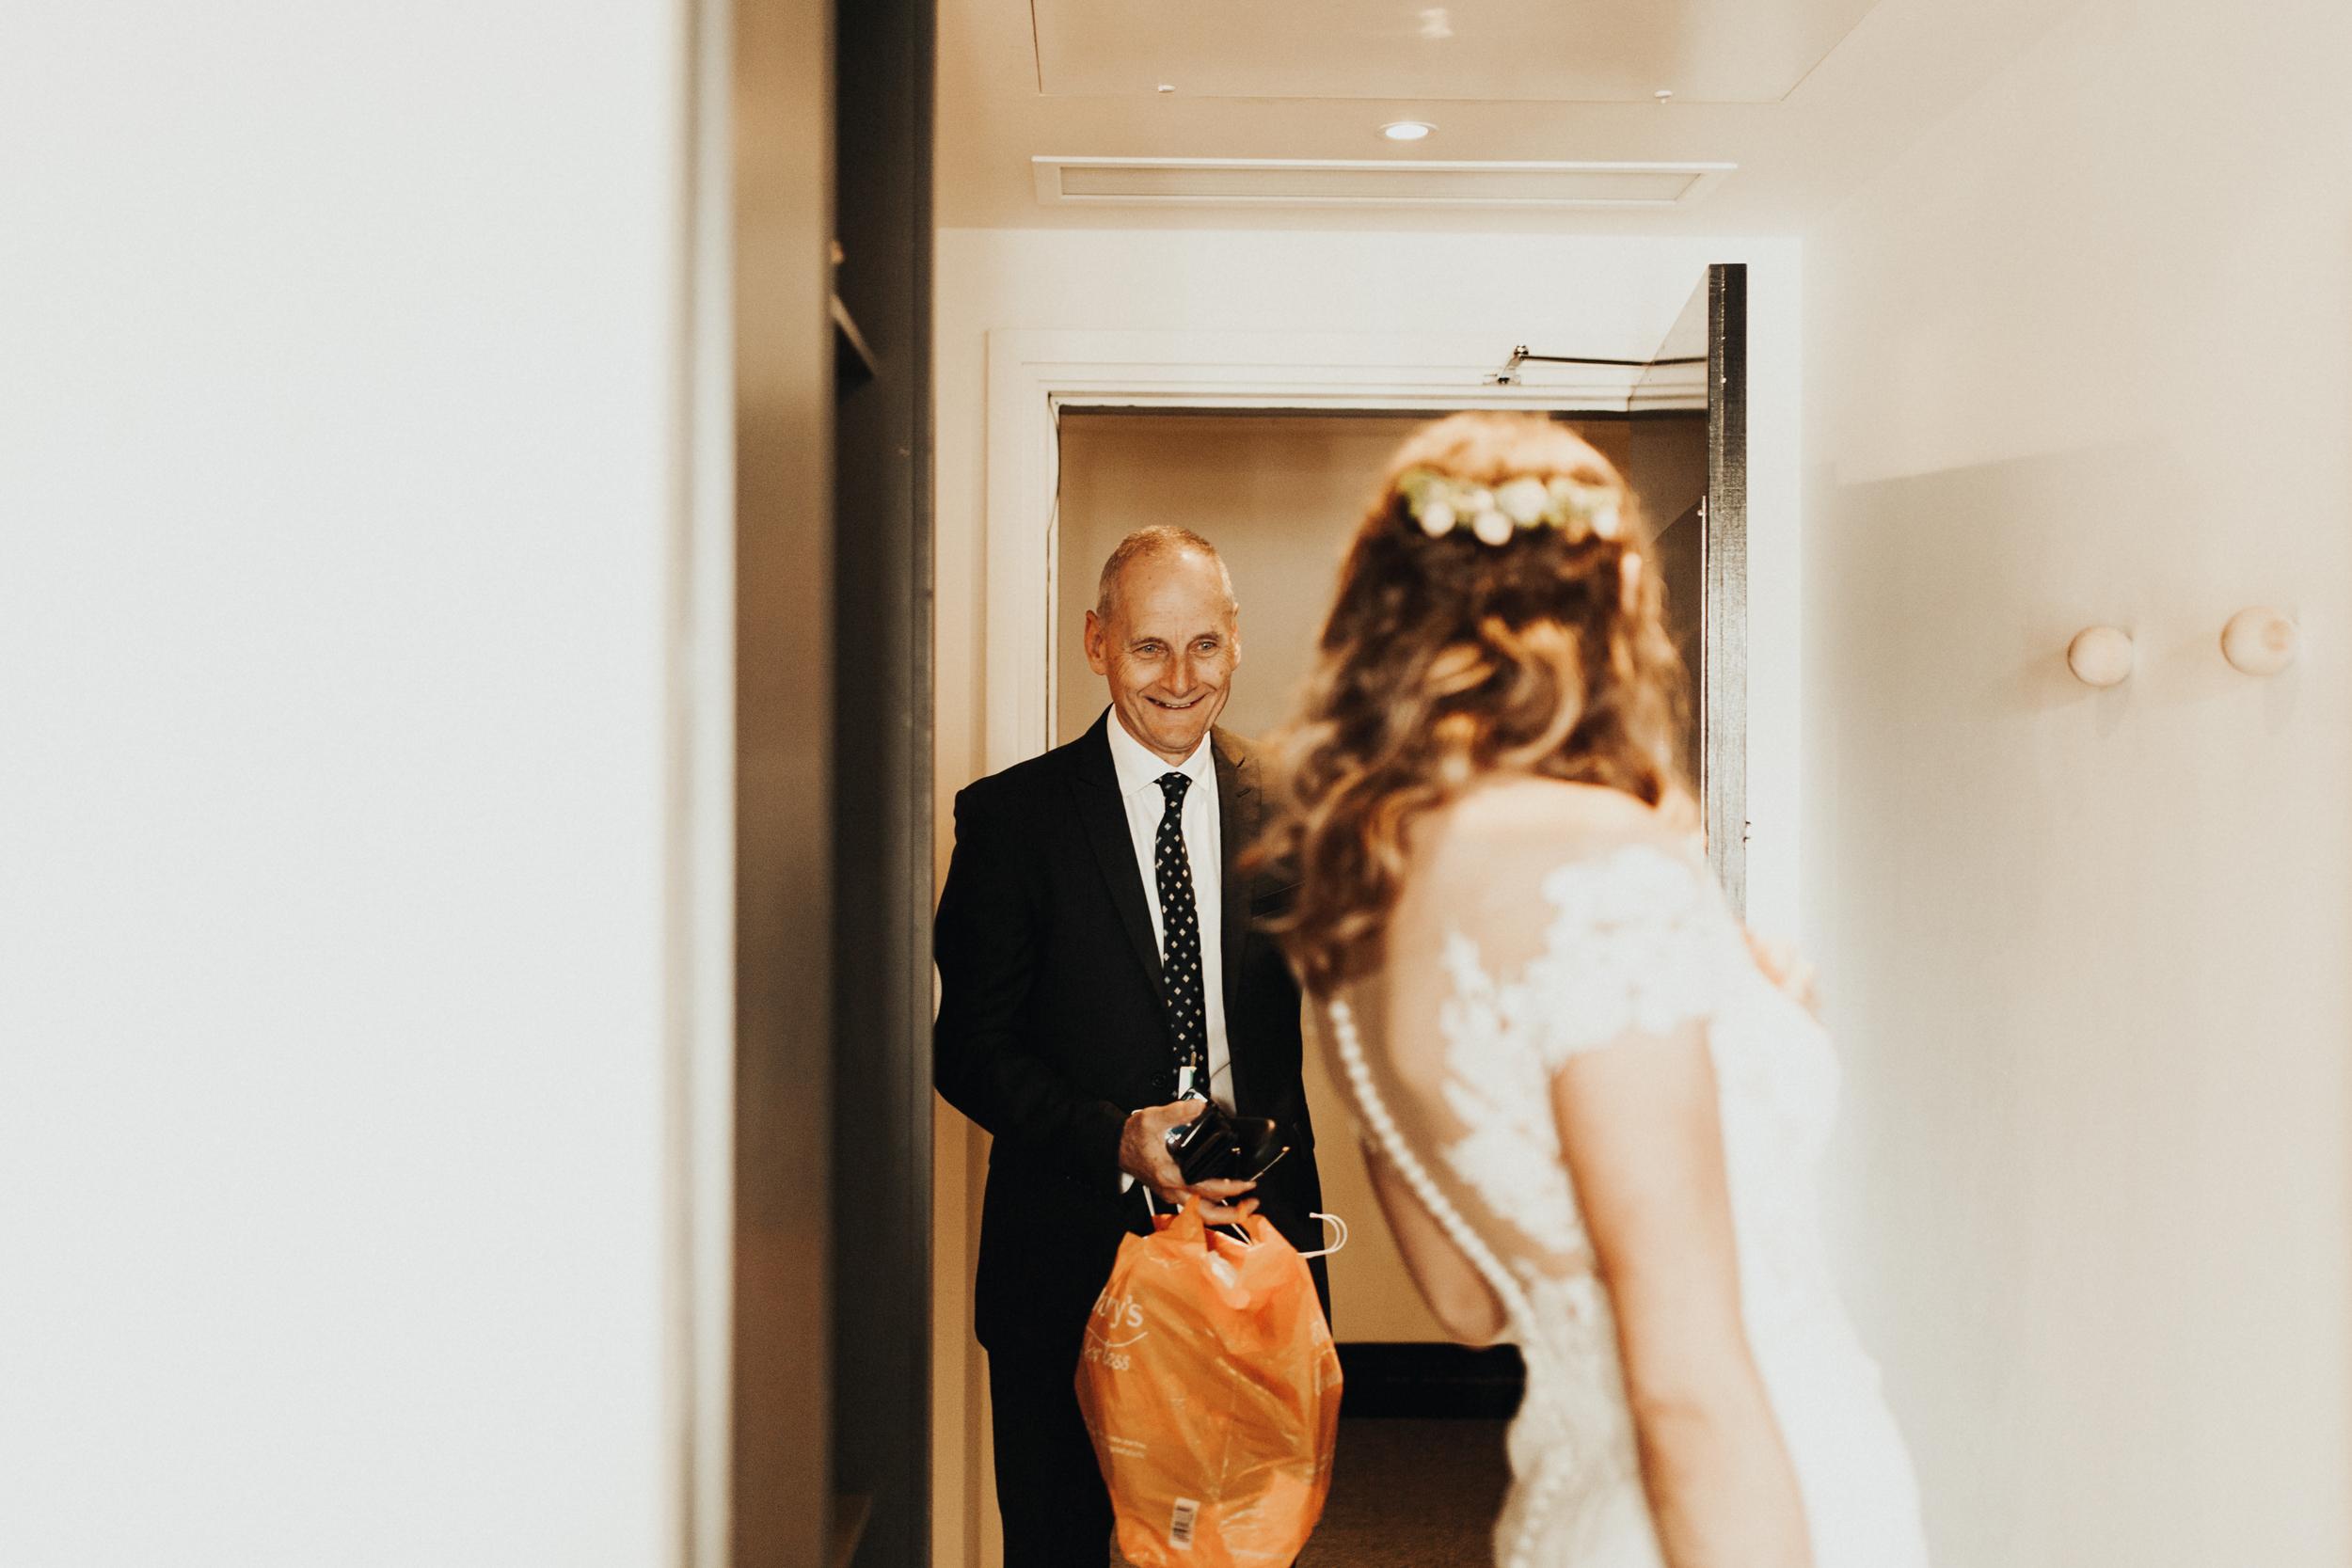 Laura-Benn-The-Asylum-London-The-Ace-Hotel-Wedding-Alternative-Darina-Stoda-Photography-68.jpg